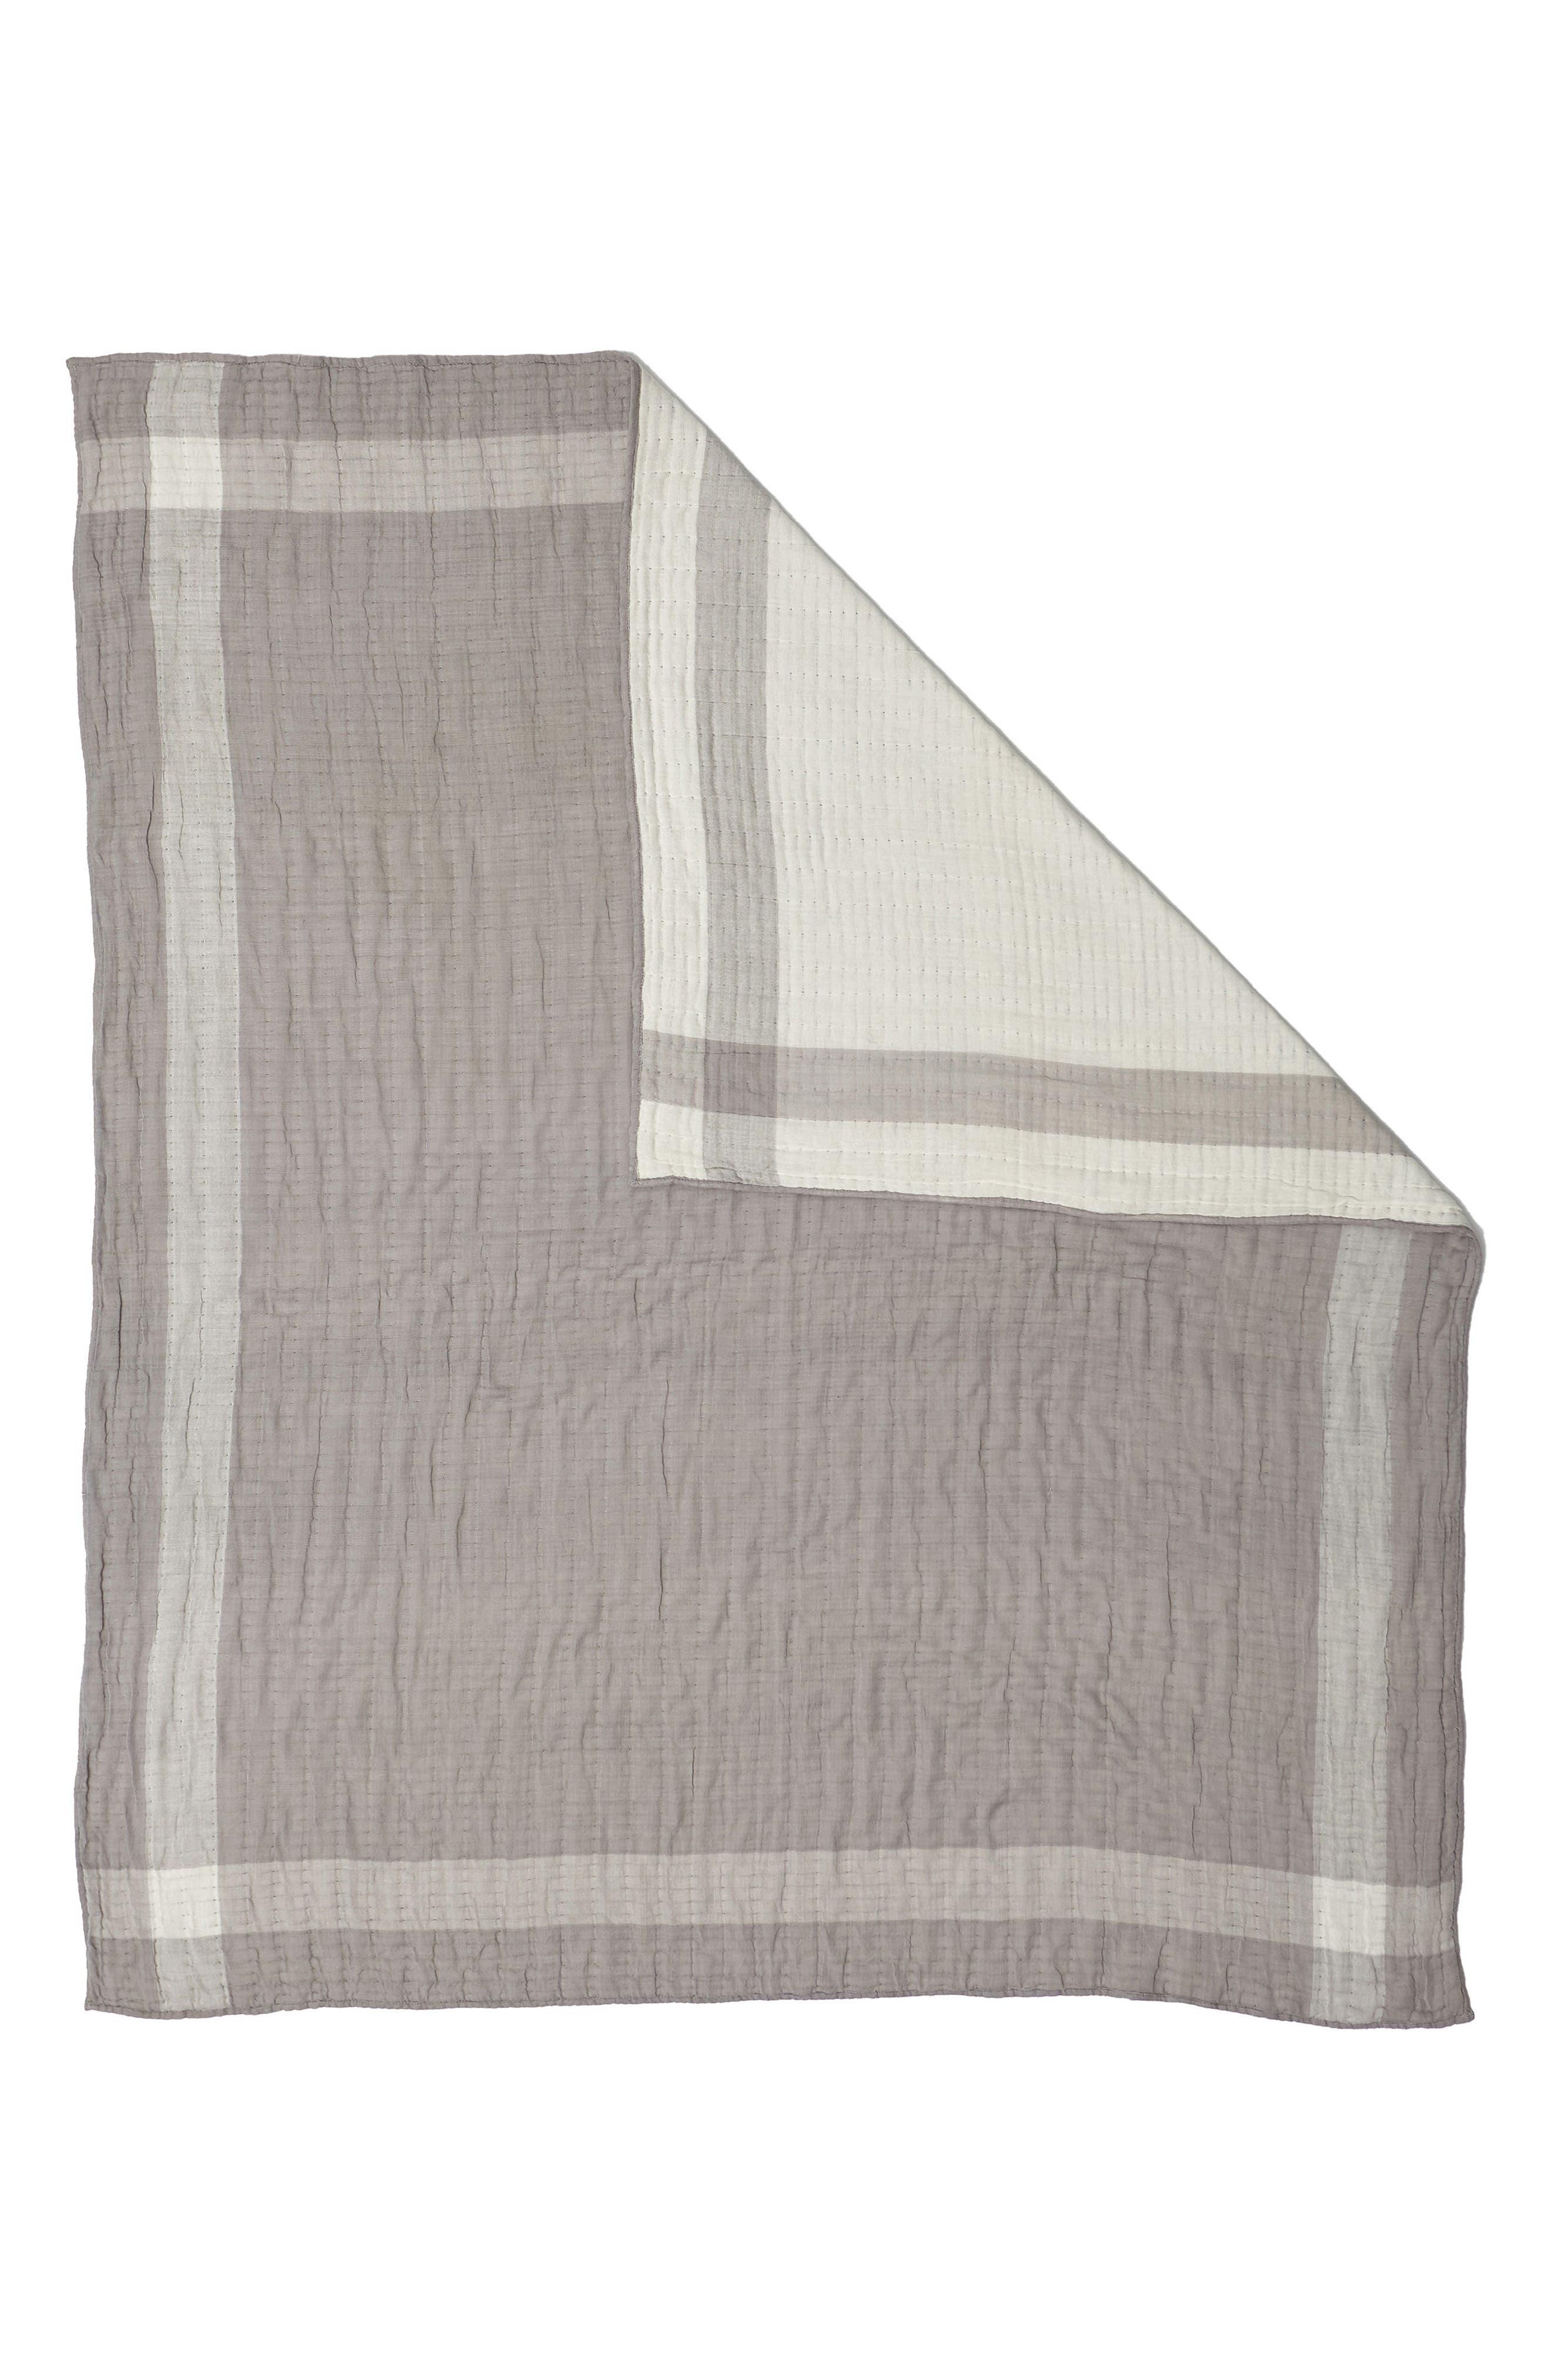 Sidekick Blanket,                             Main thumbnail 1, color,                             Grey